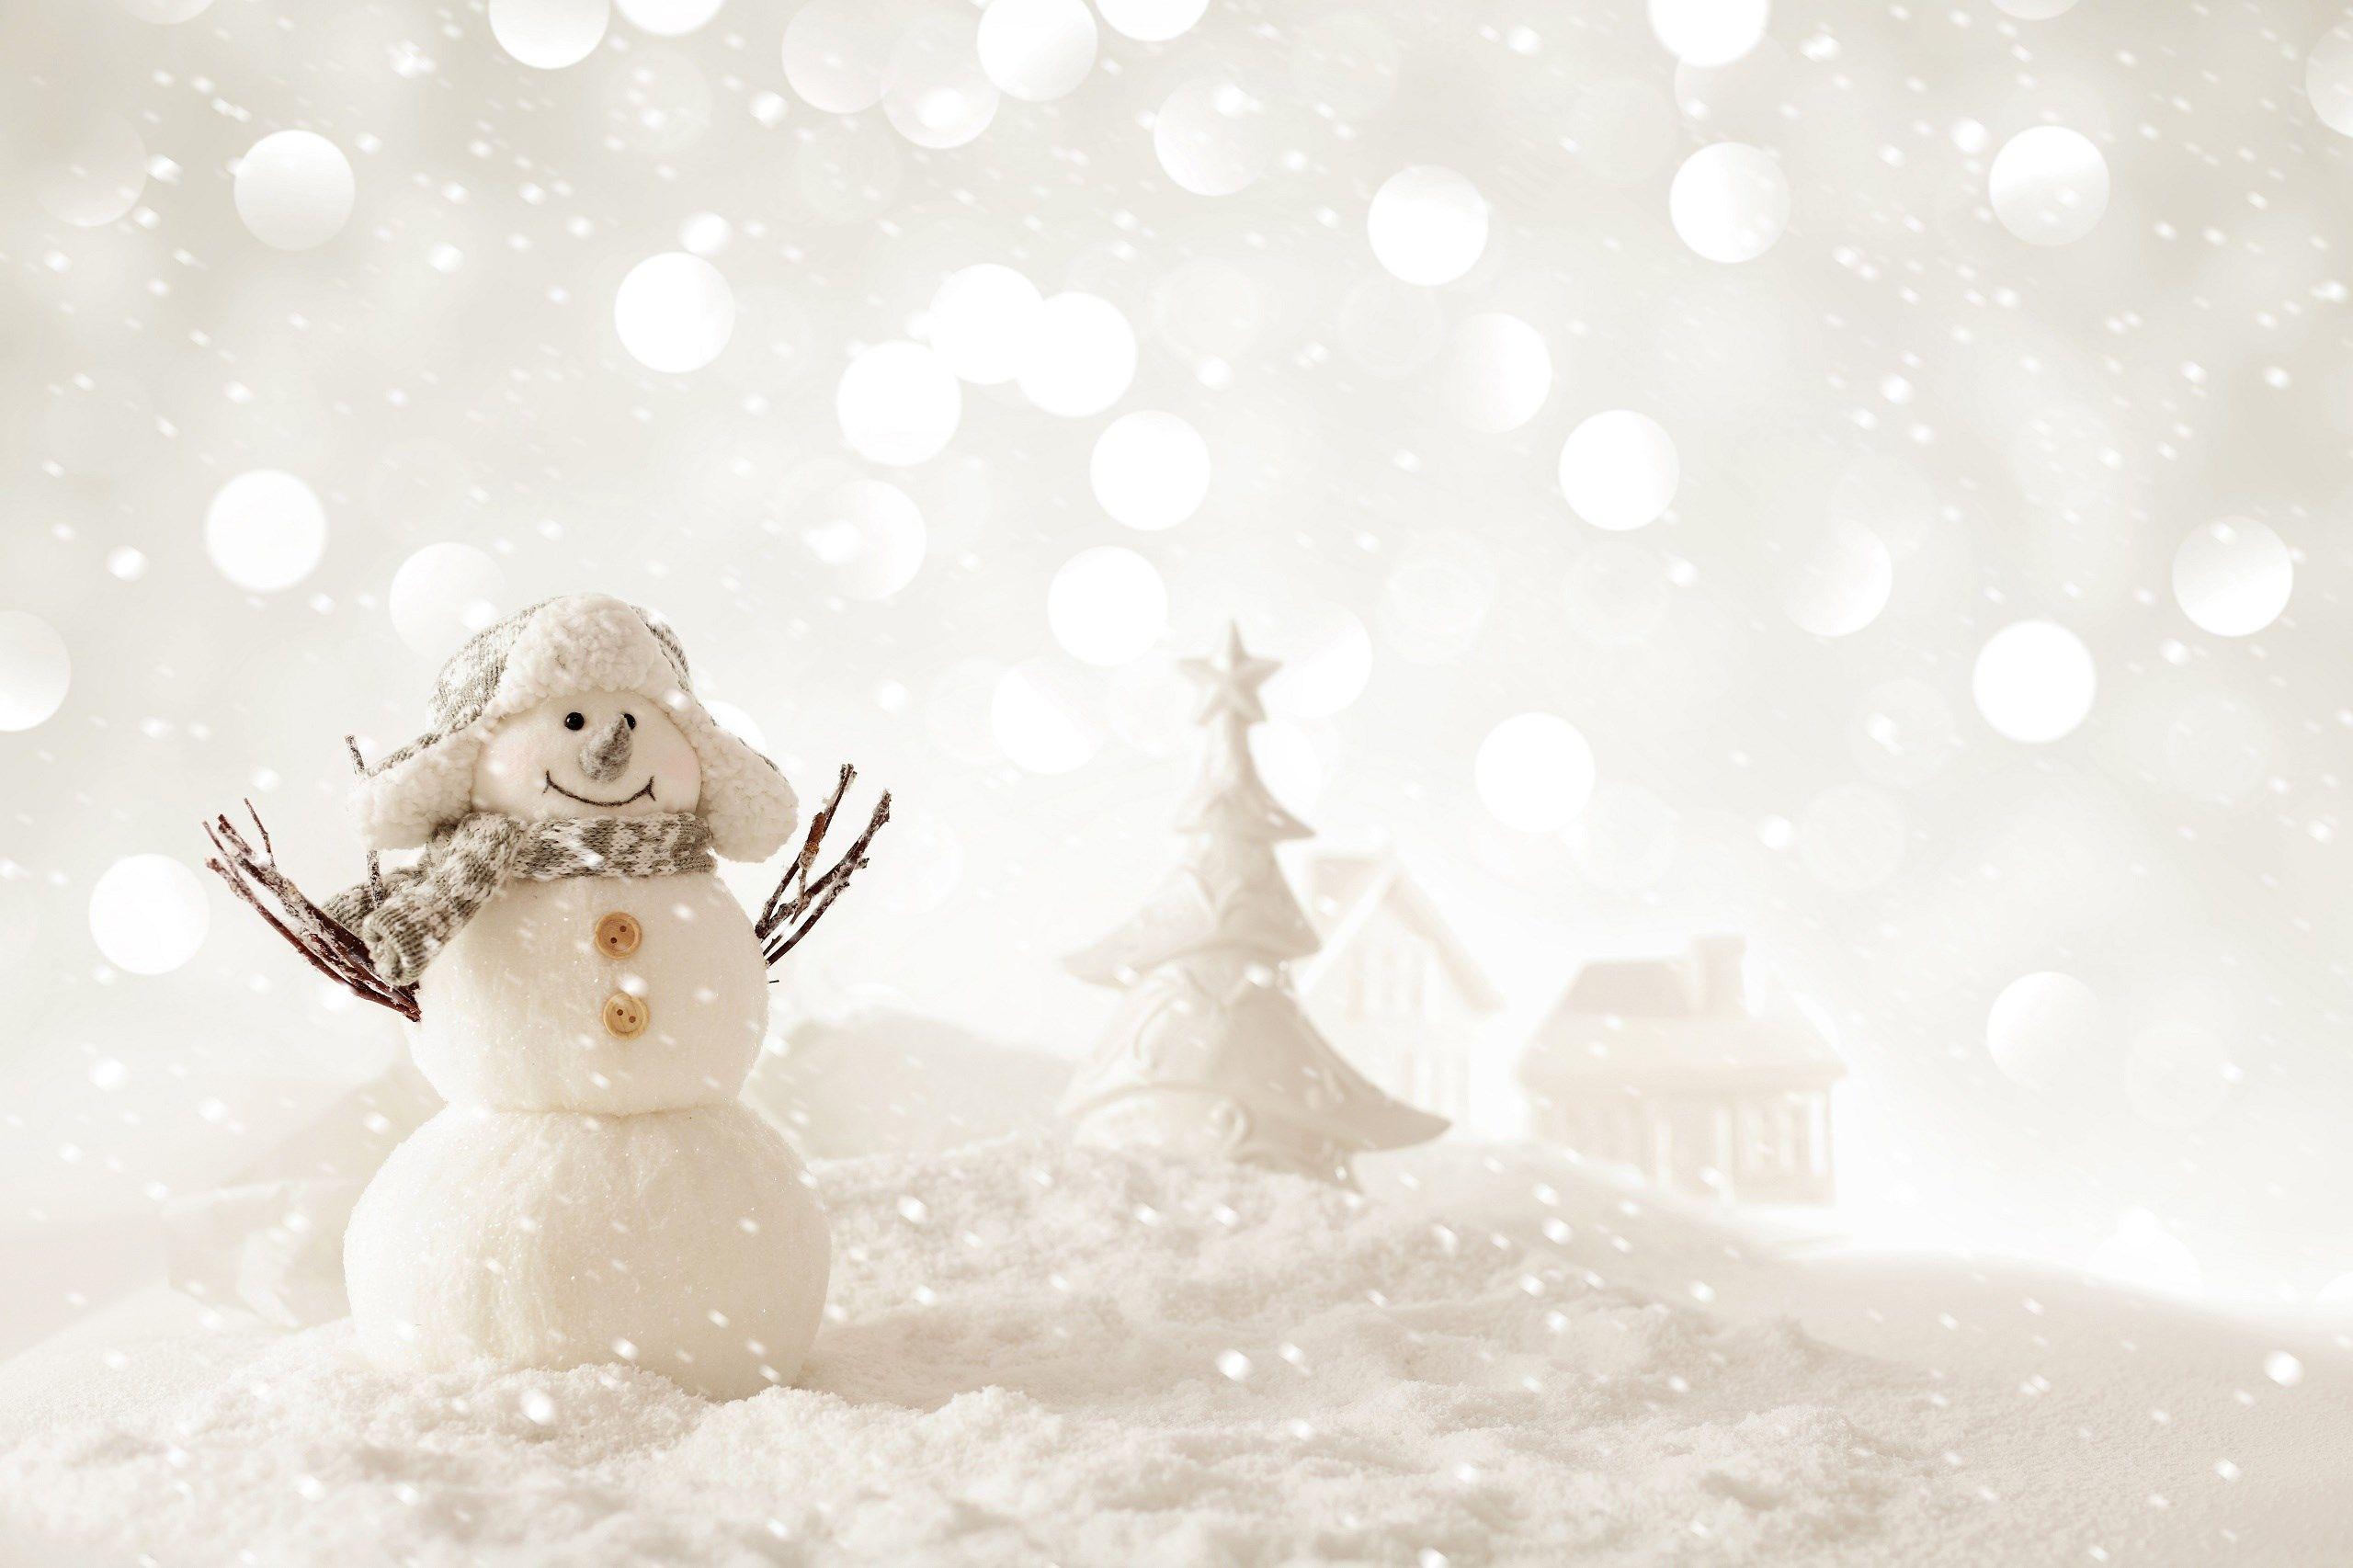 2560x1706 free desktop wallpaper downloads christmas (With